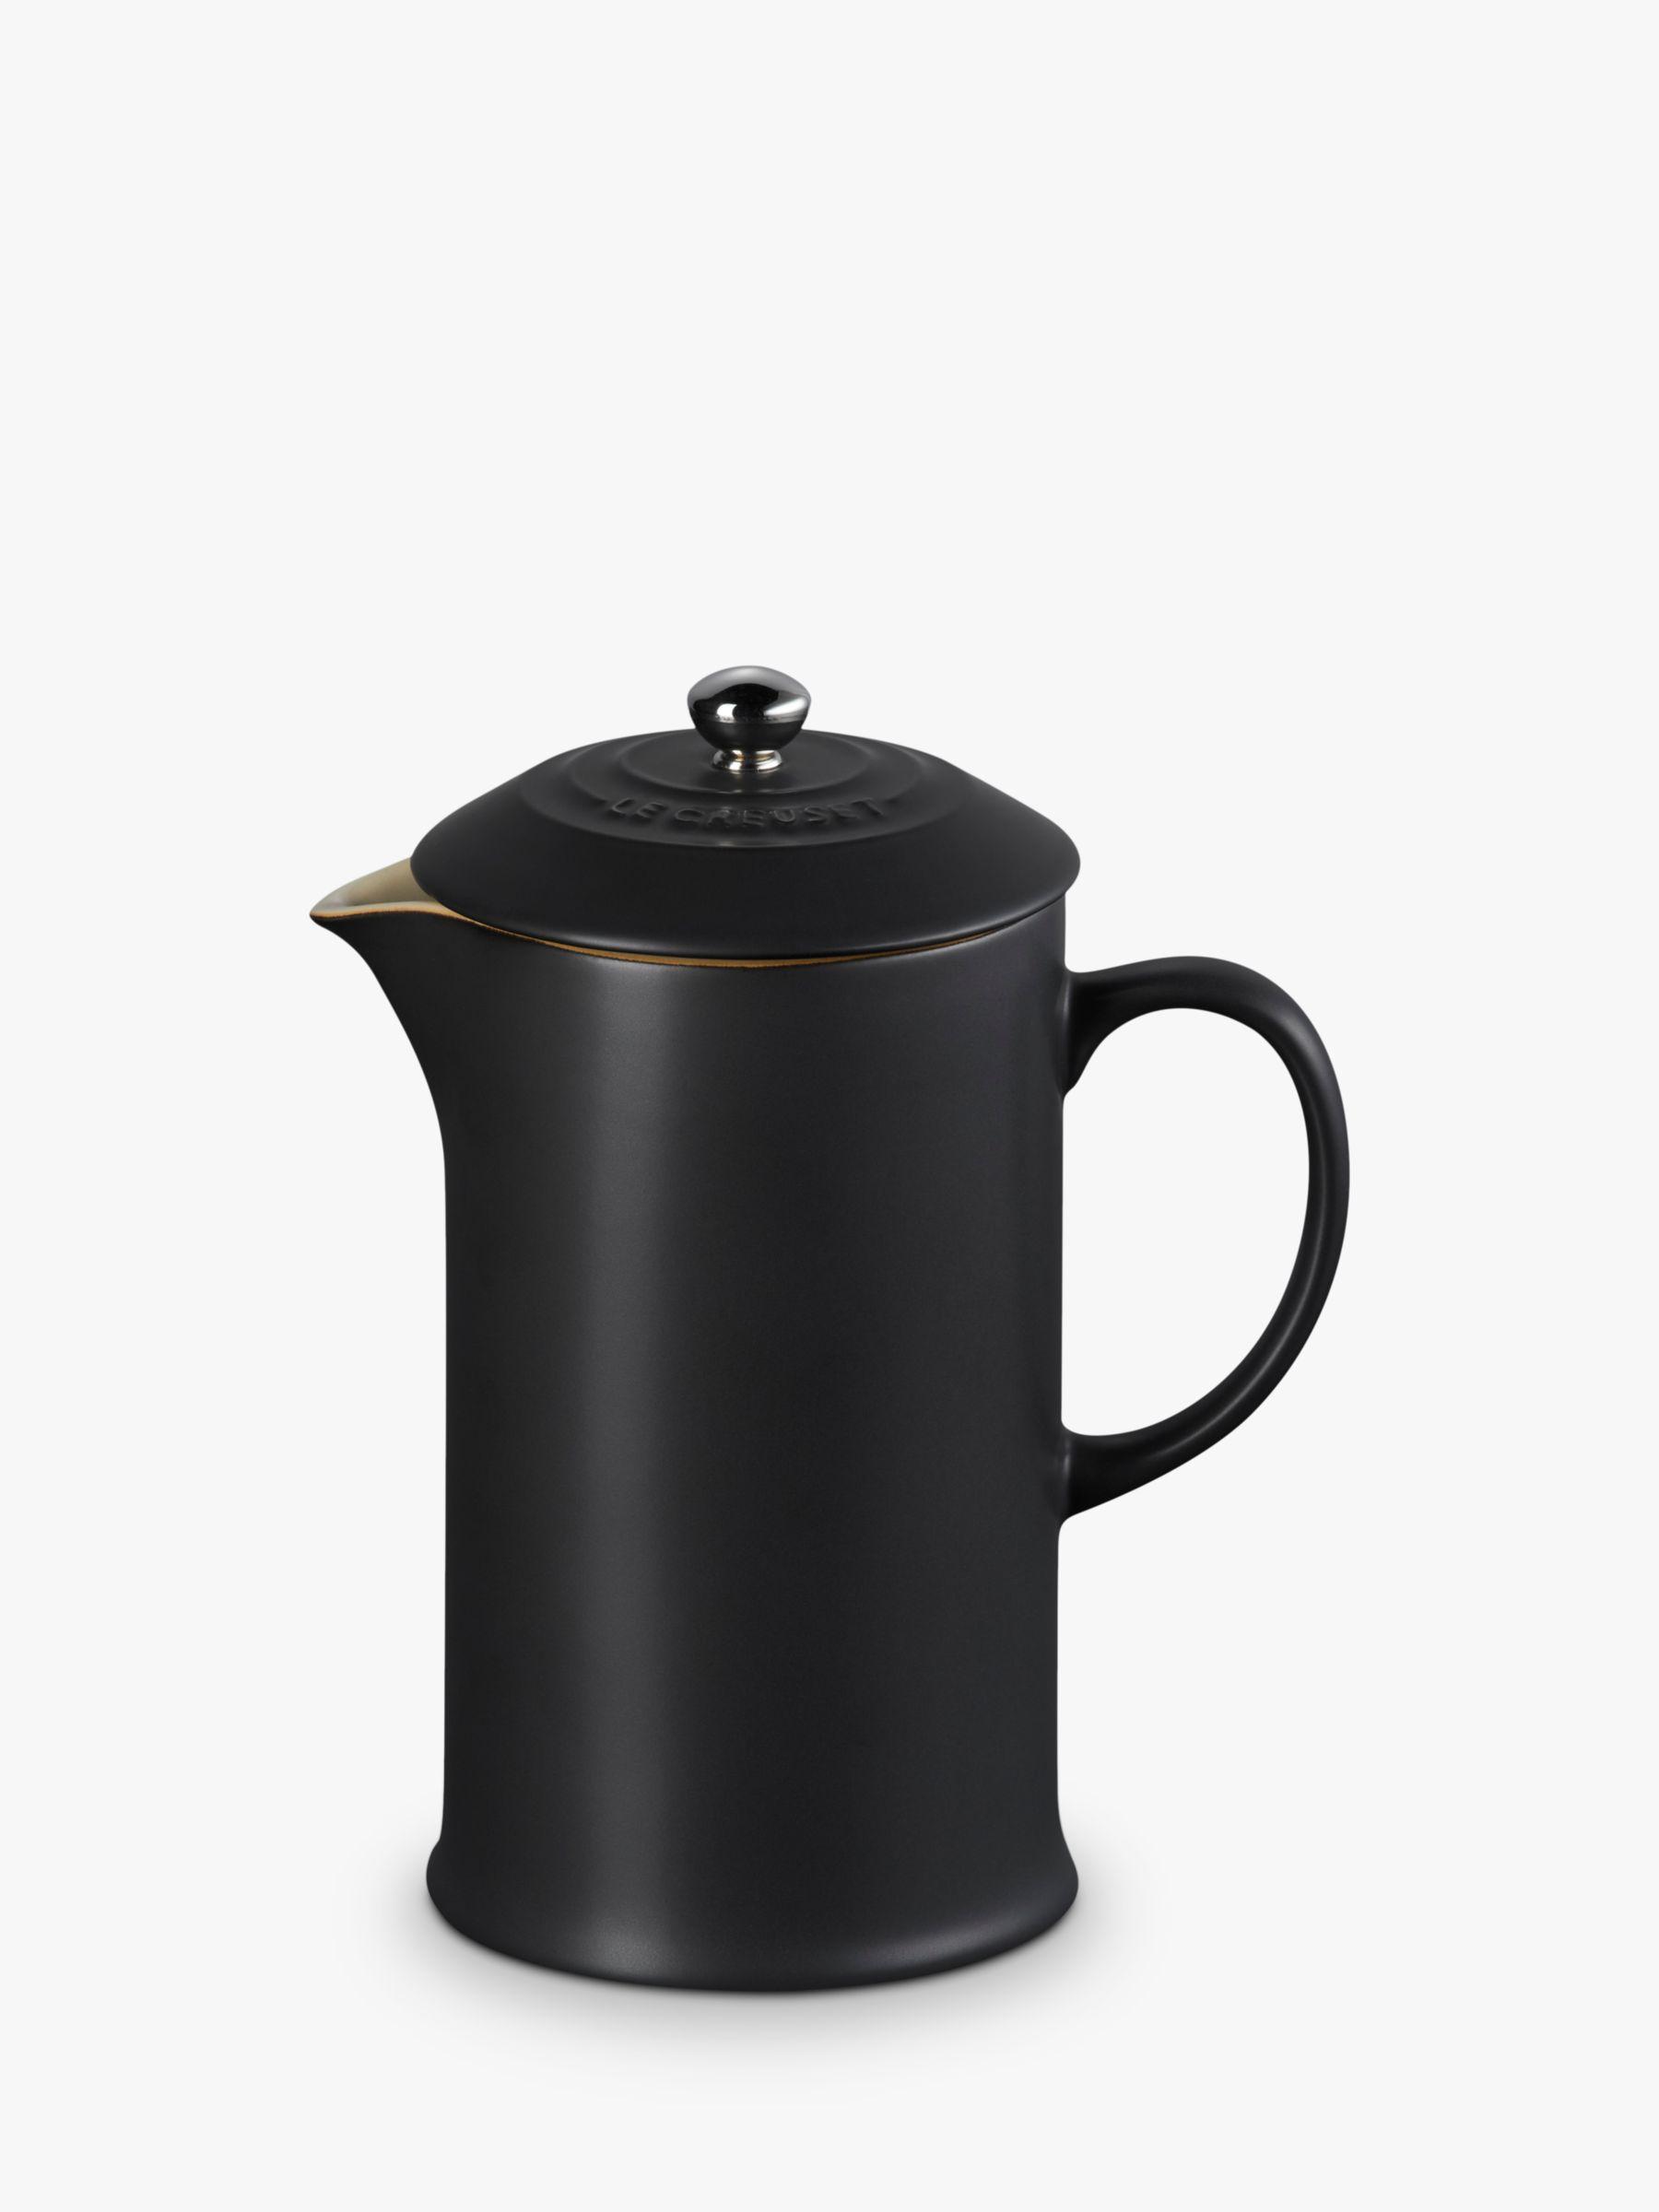 Le Creuset Le Creuset Stoneware Coffee Press